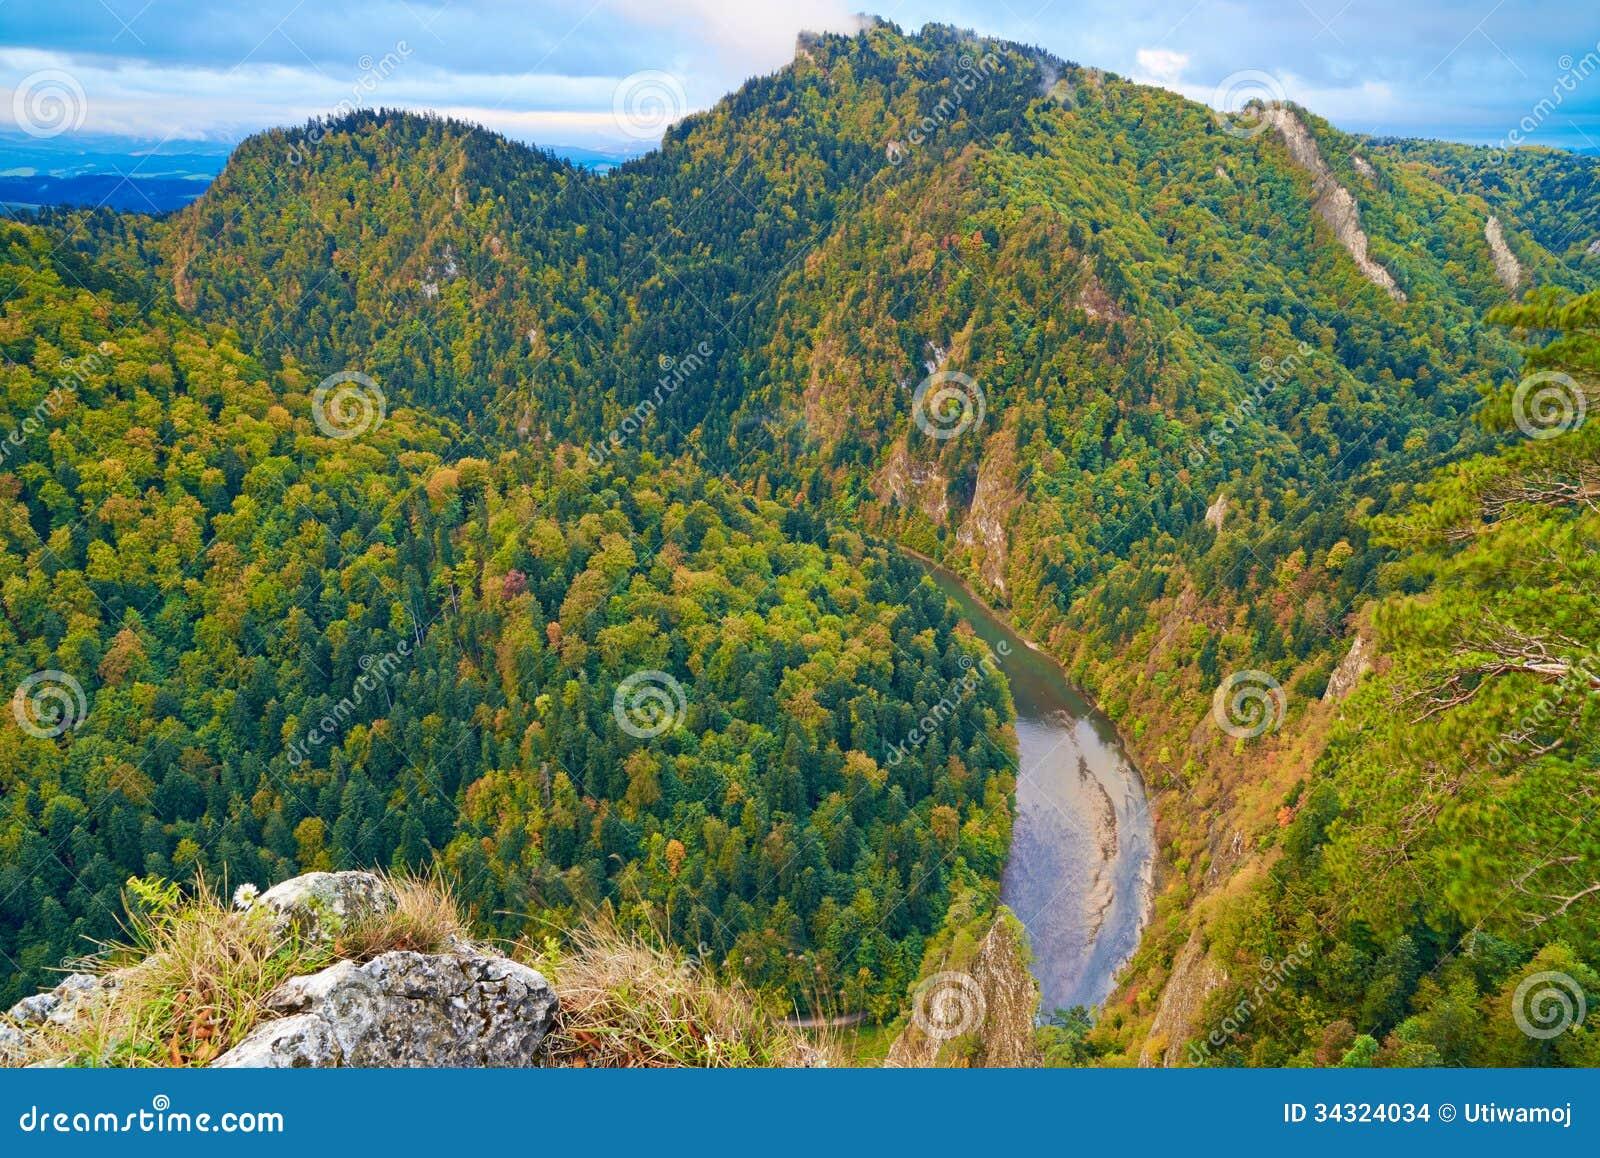 The Dunajec River Gorge. The Pieniny Mountains.